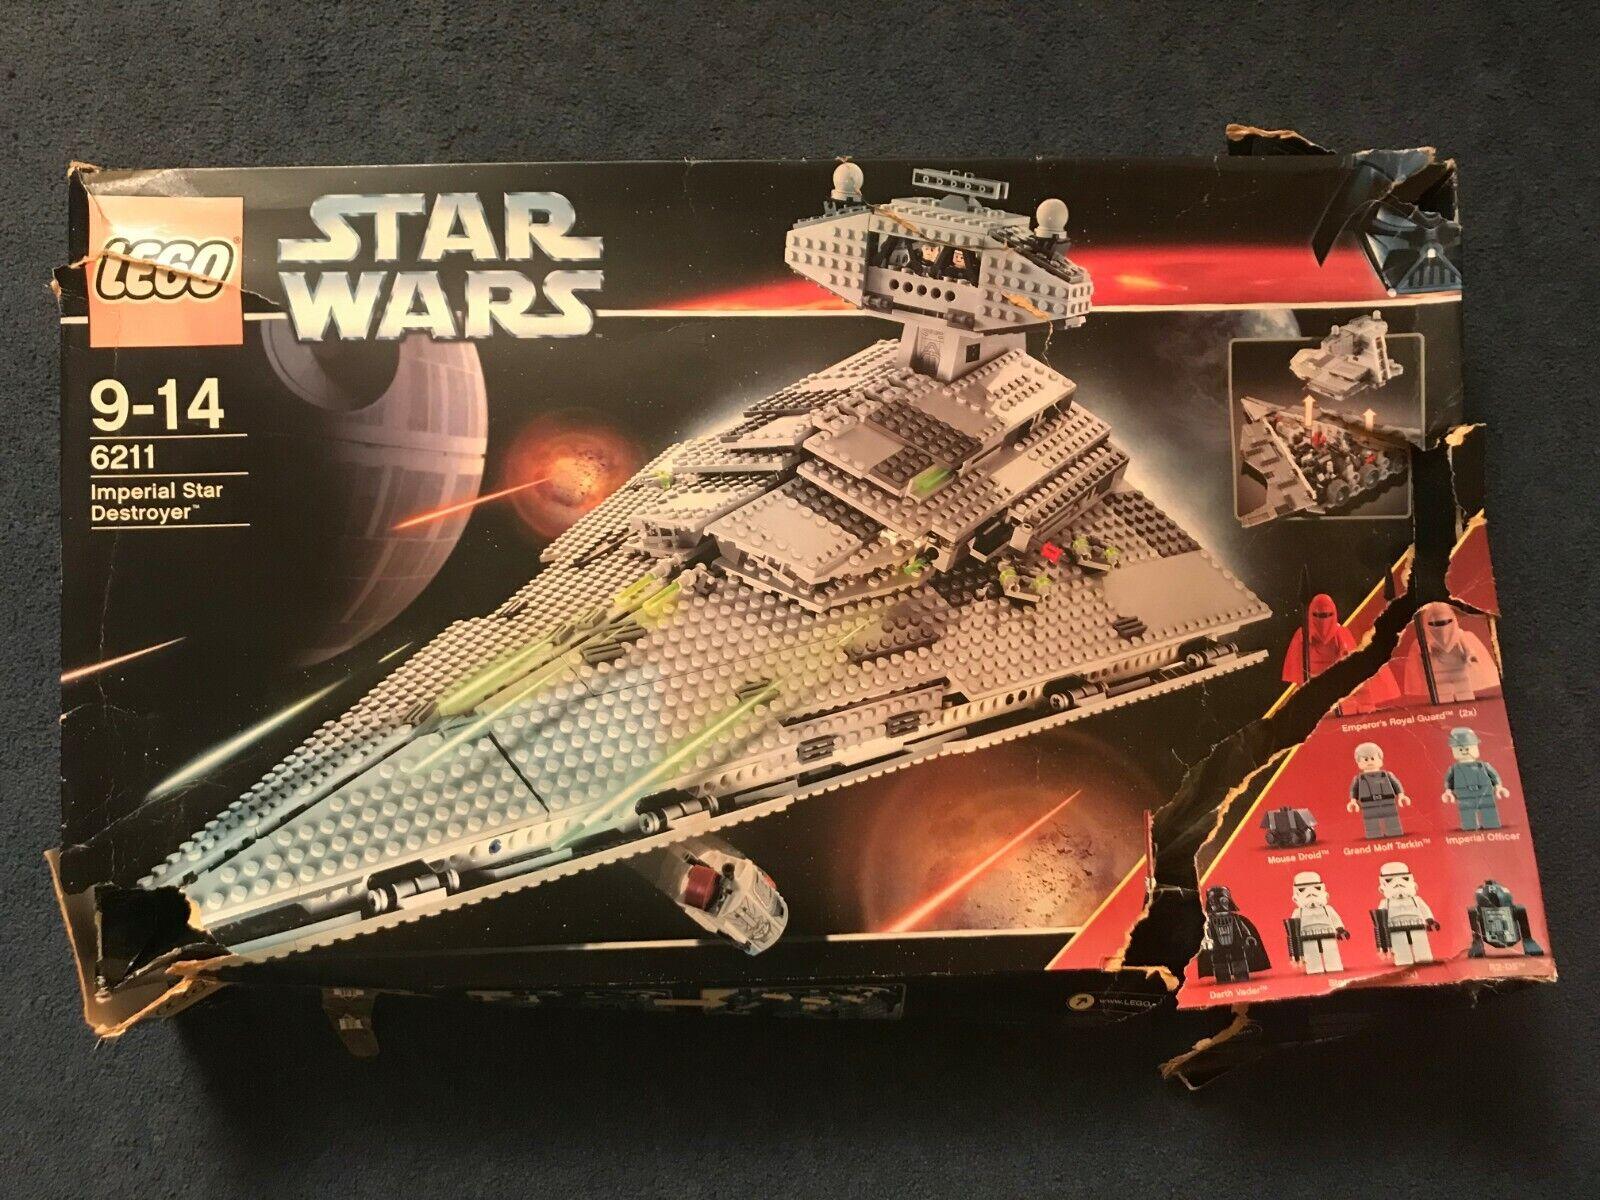 LEGO Star Wars 6211 Imperial Star Destroyer - New Damaged Box (SEE DESCRIPTION)